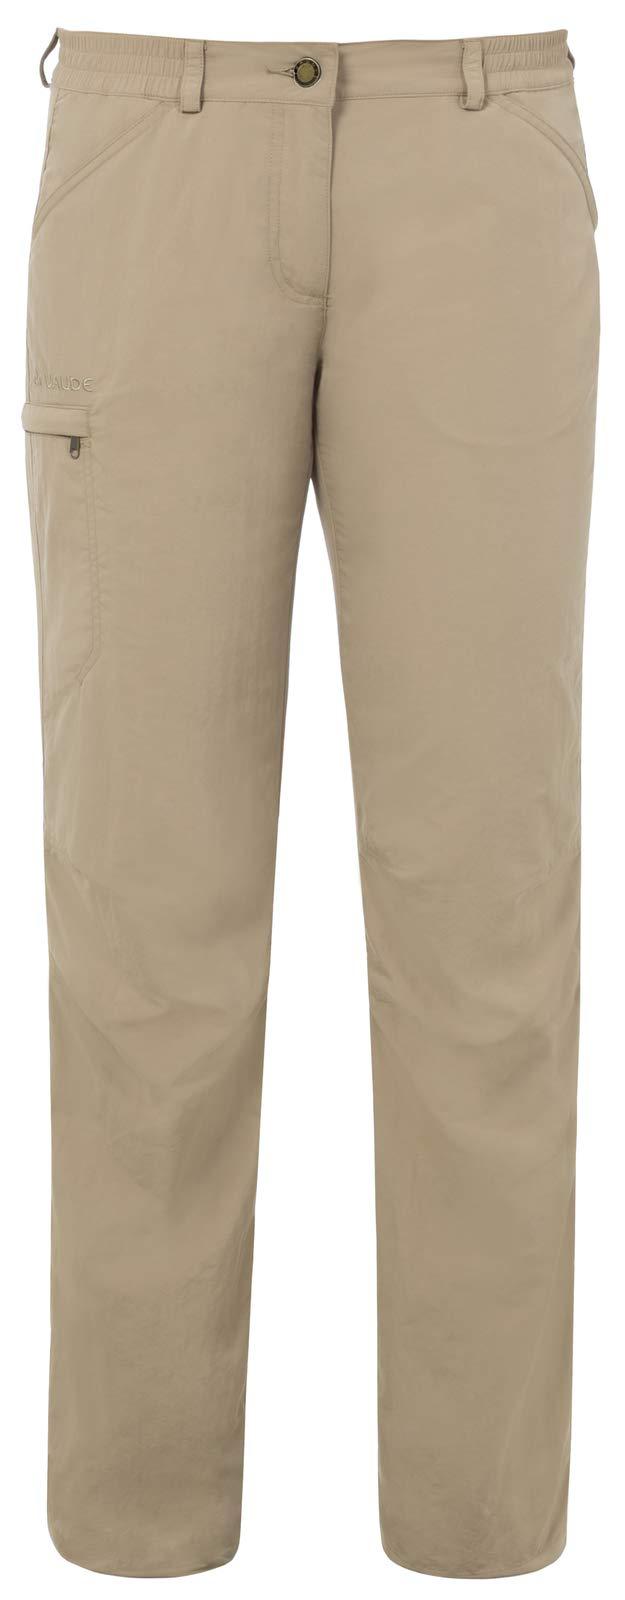 VAUDE Damen Hose Farley Pants IV, Muddy, 40, 03872